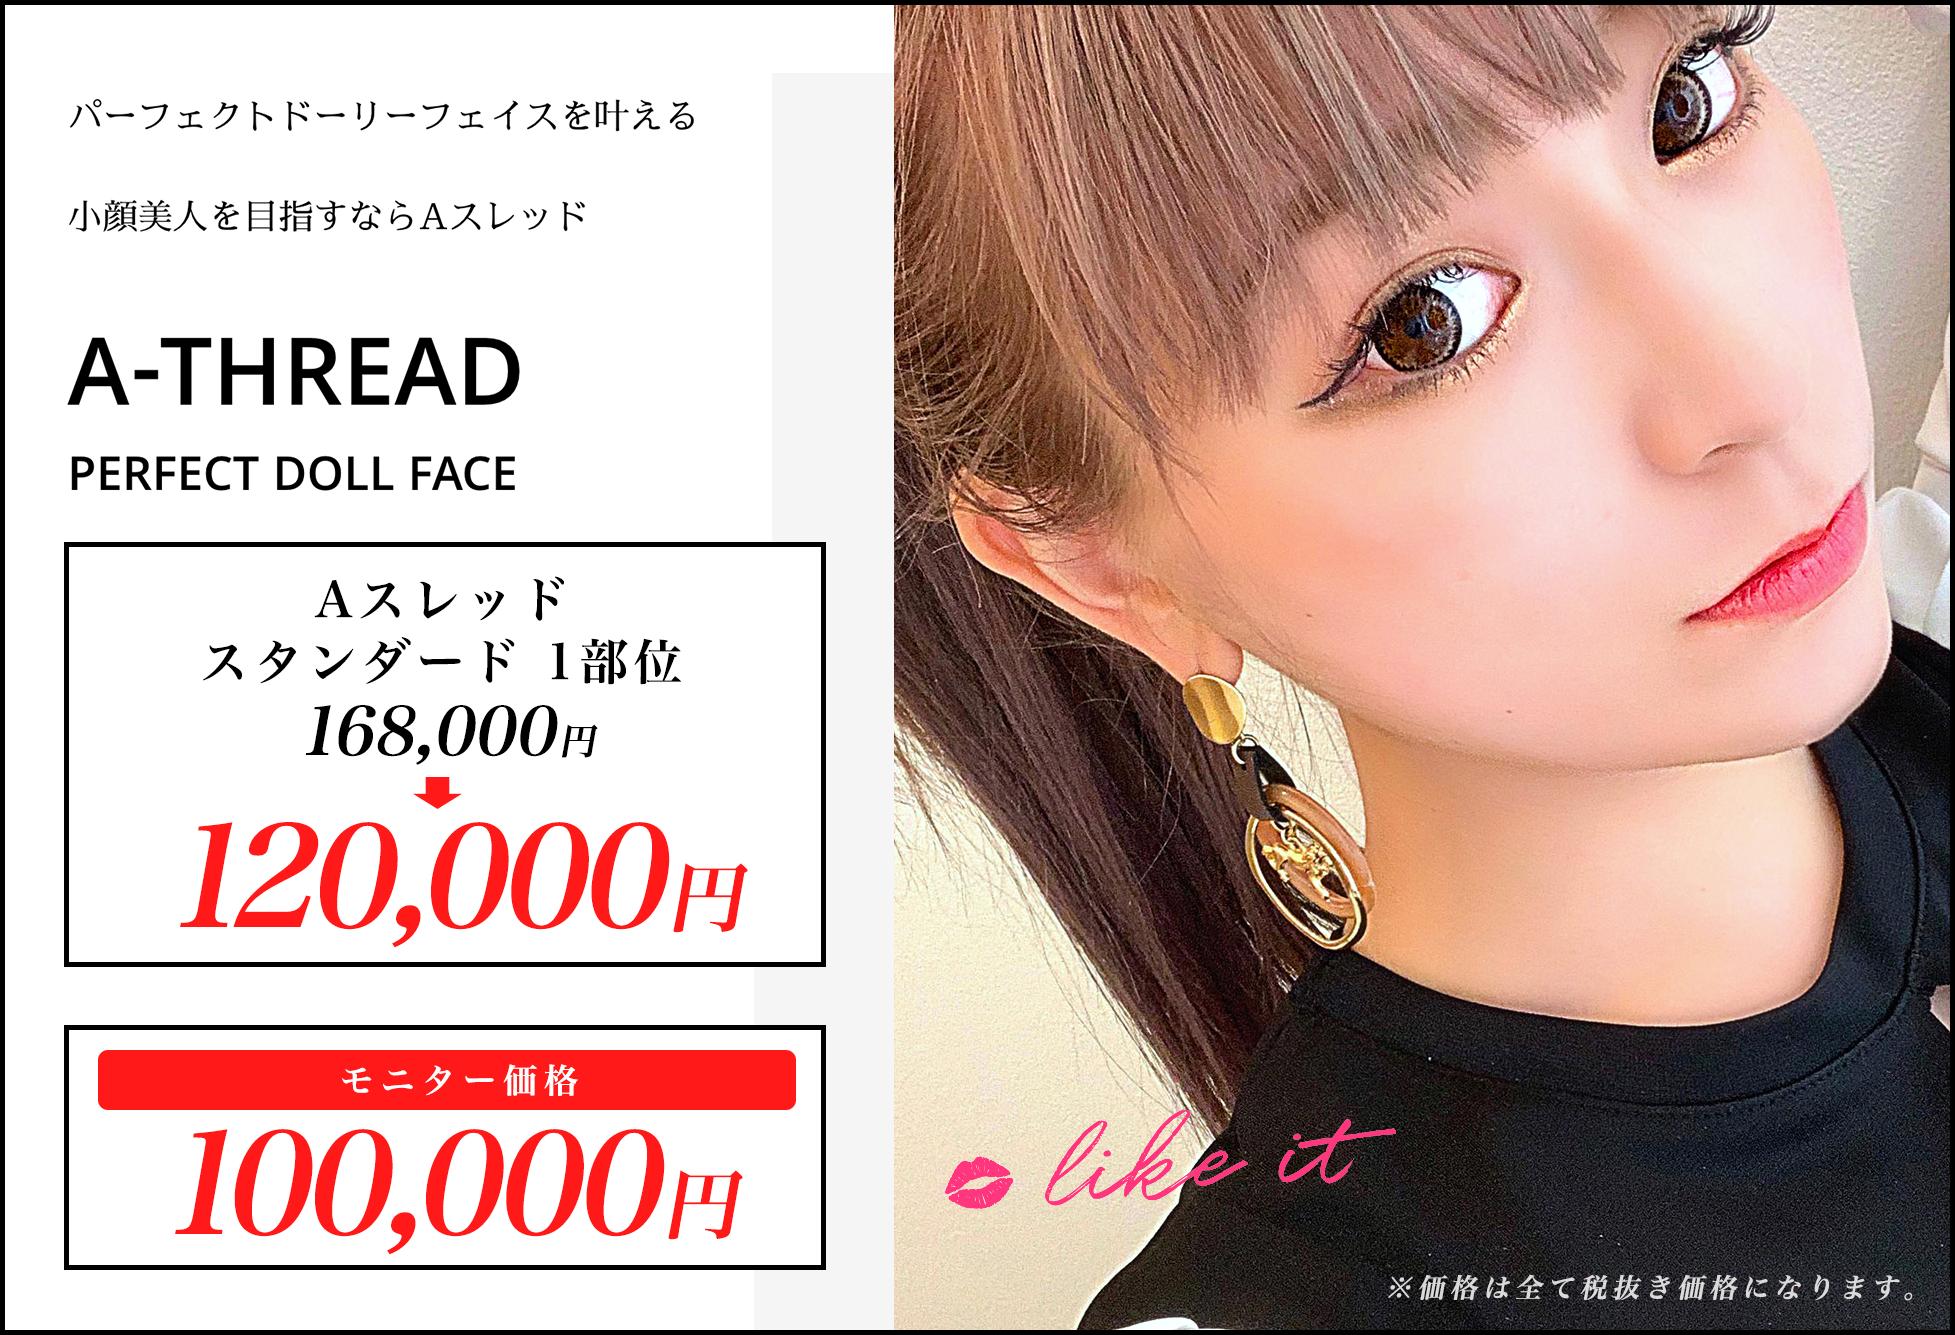 Aスレッド1部位 100,000円